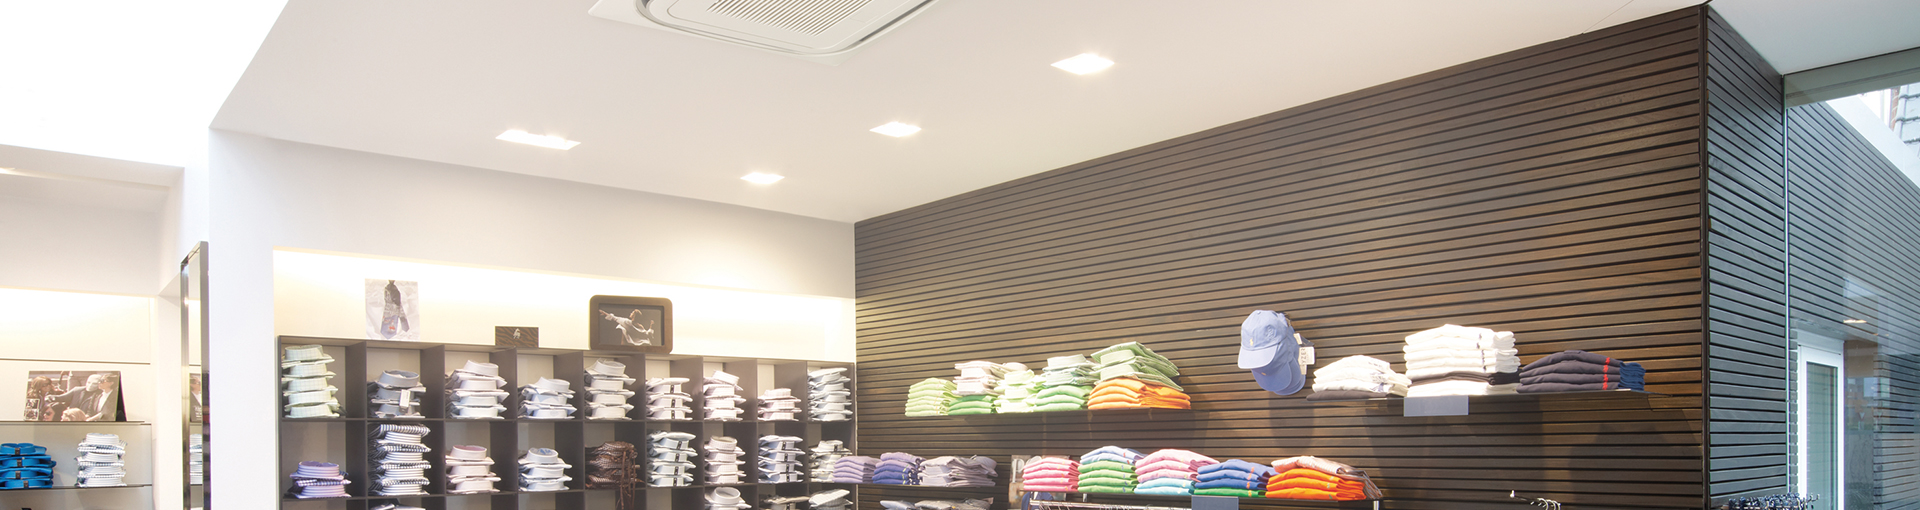 Regal Shop Air Conditioning